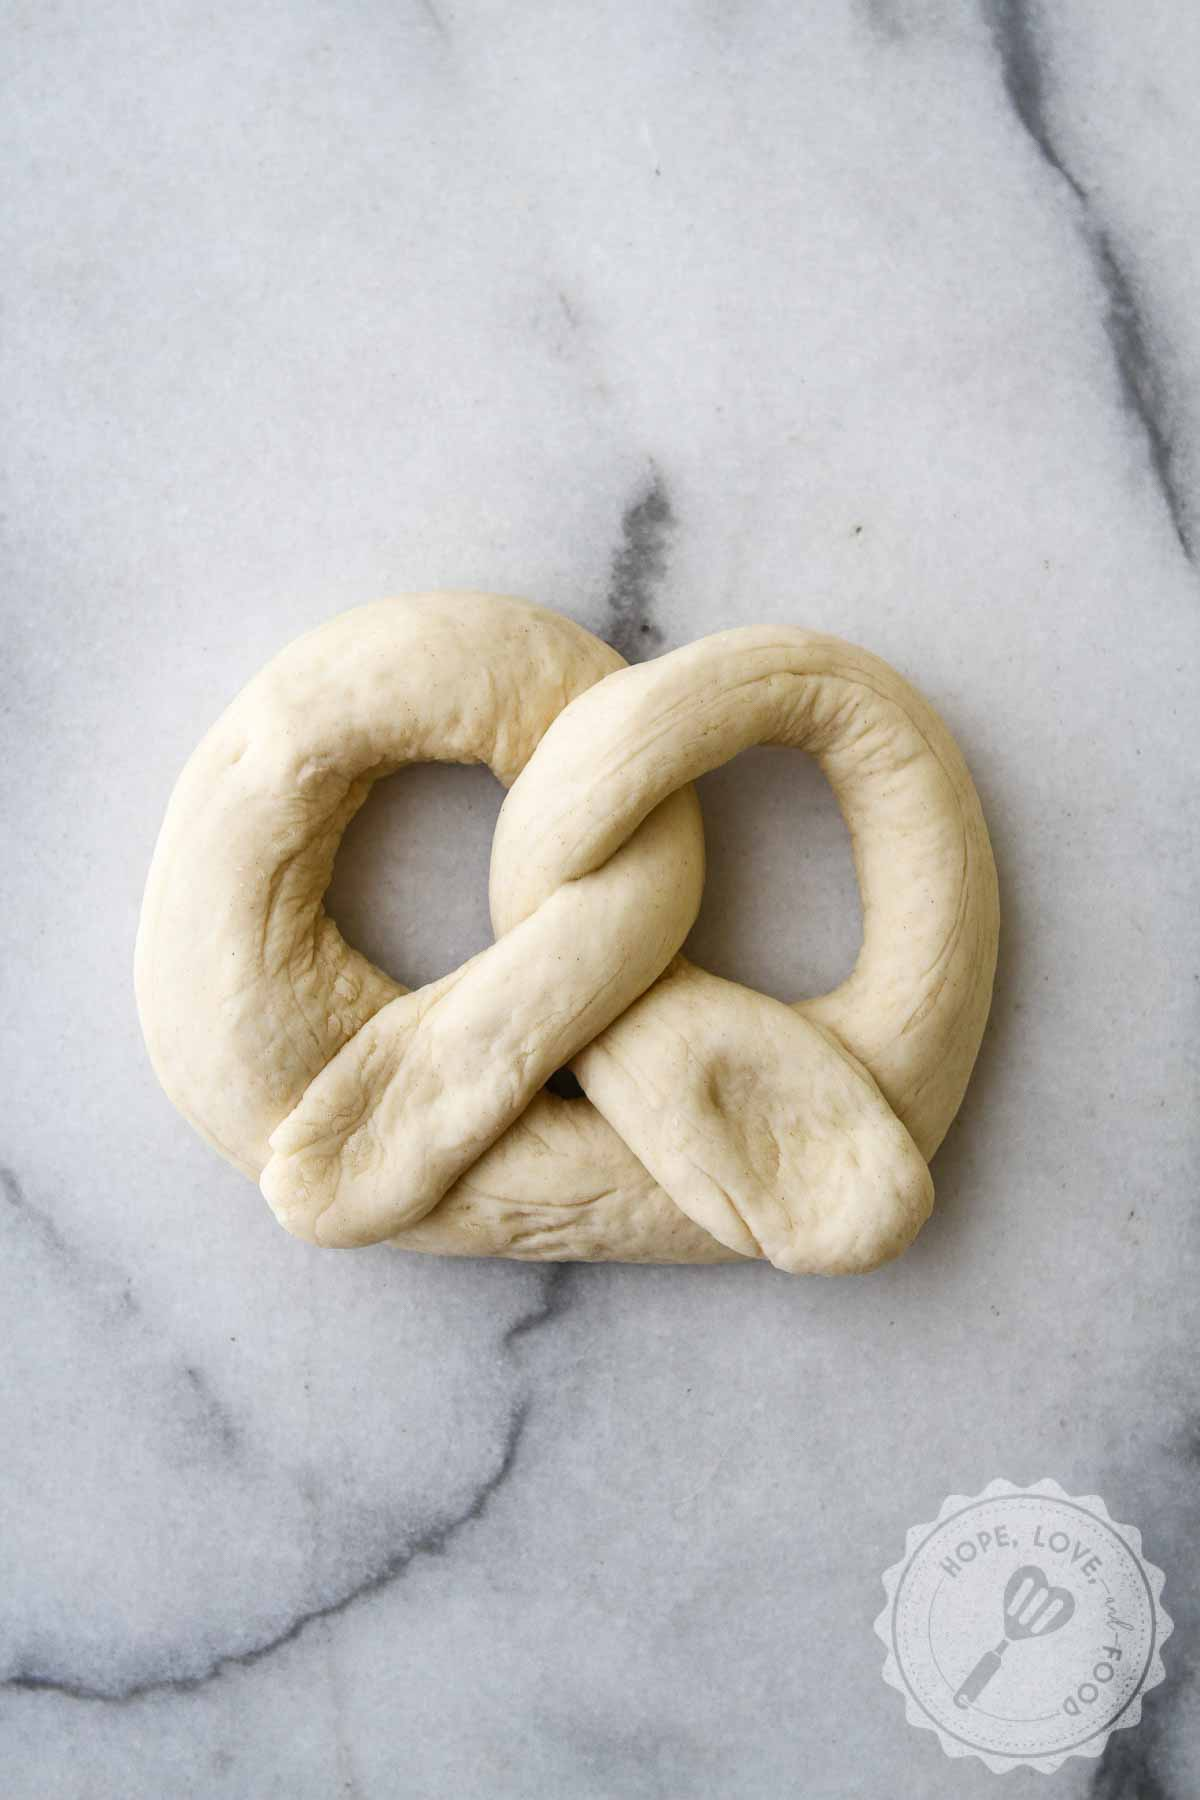 Shaping soft pretzel dough